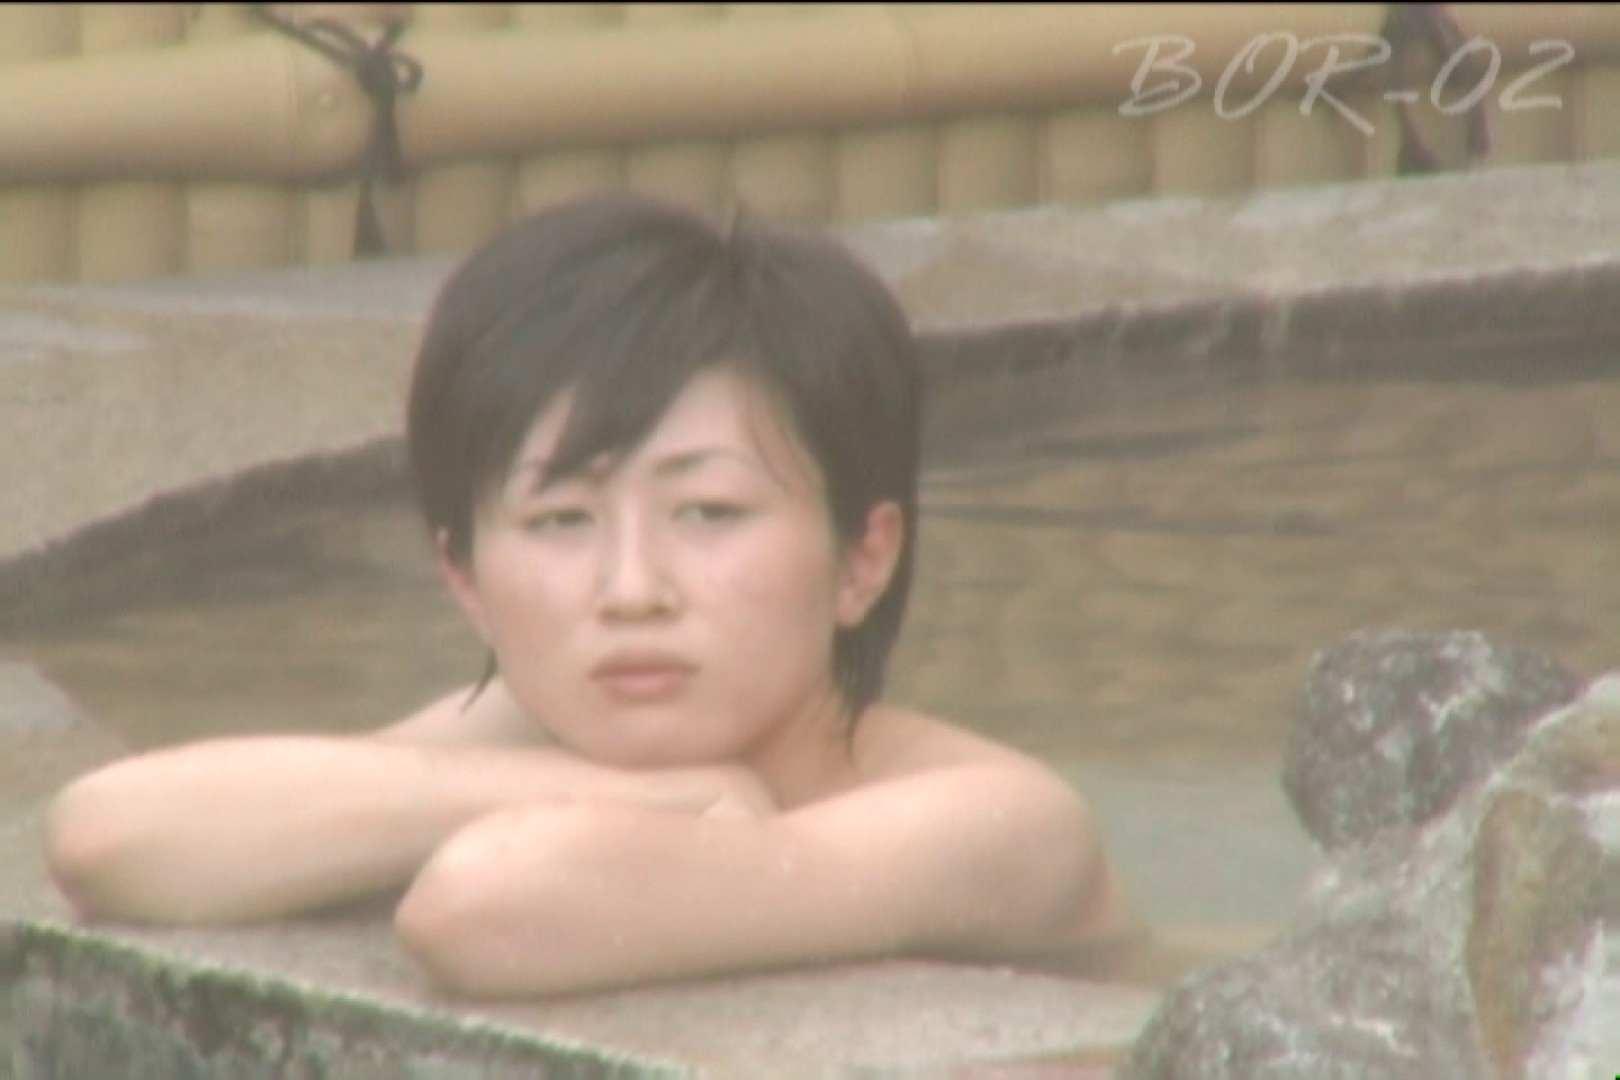 Aquaな露天風呂Vol.480 盗撮シリーズ | 露天風呂編  102PIX 35